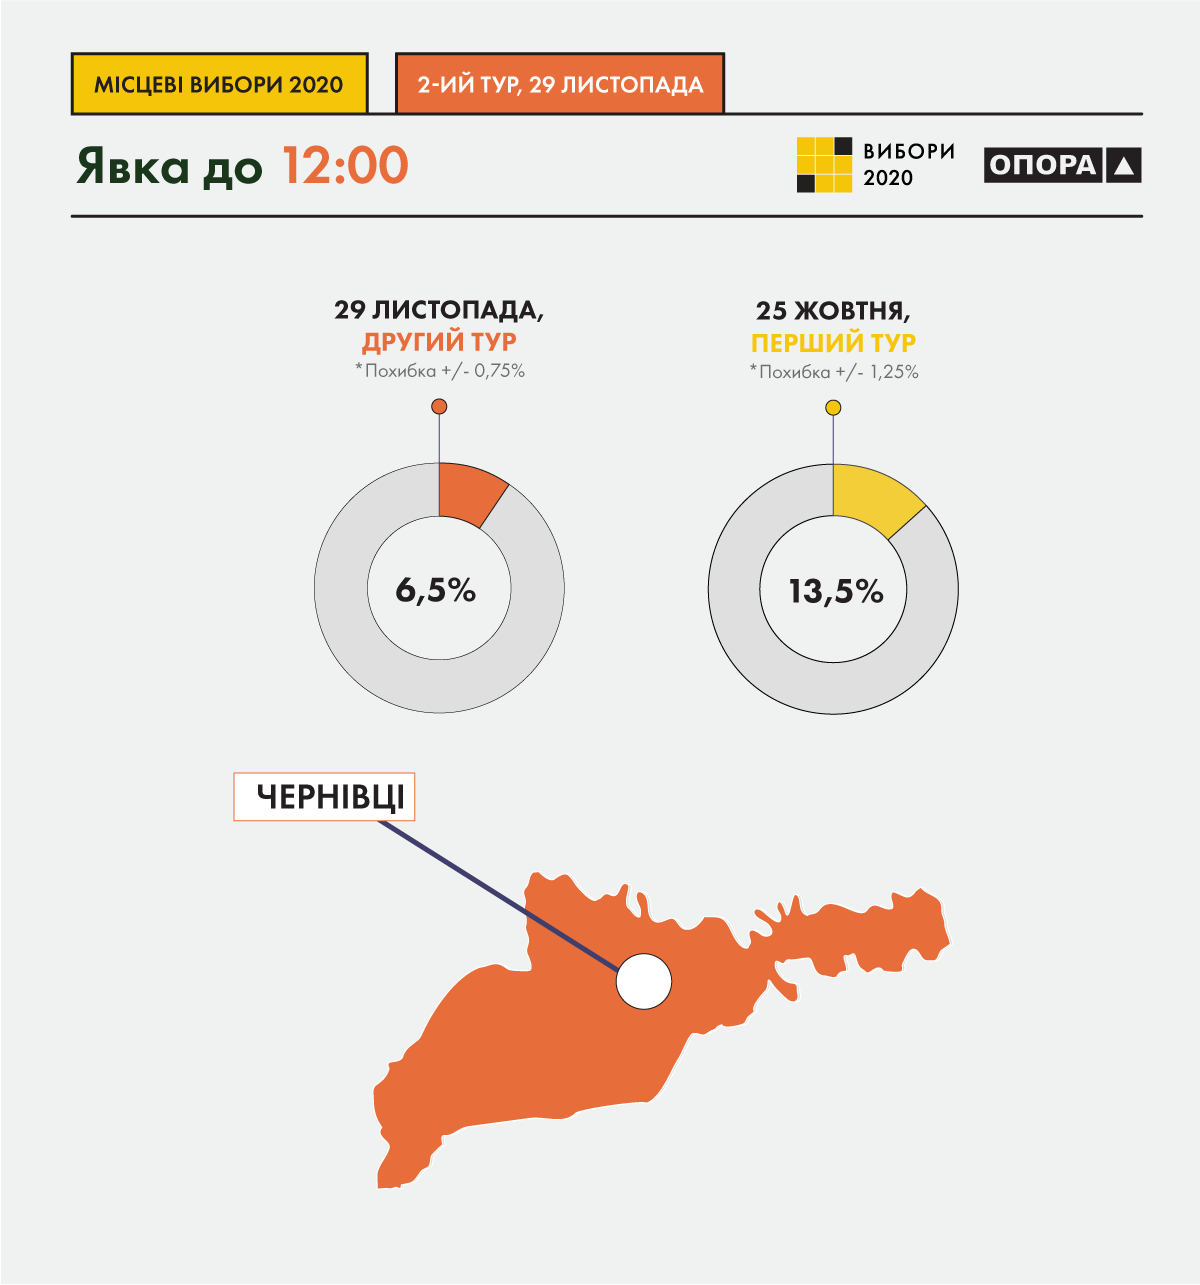 Явка во втором туре выборов мэра Черновцов на 12:00